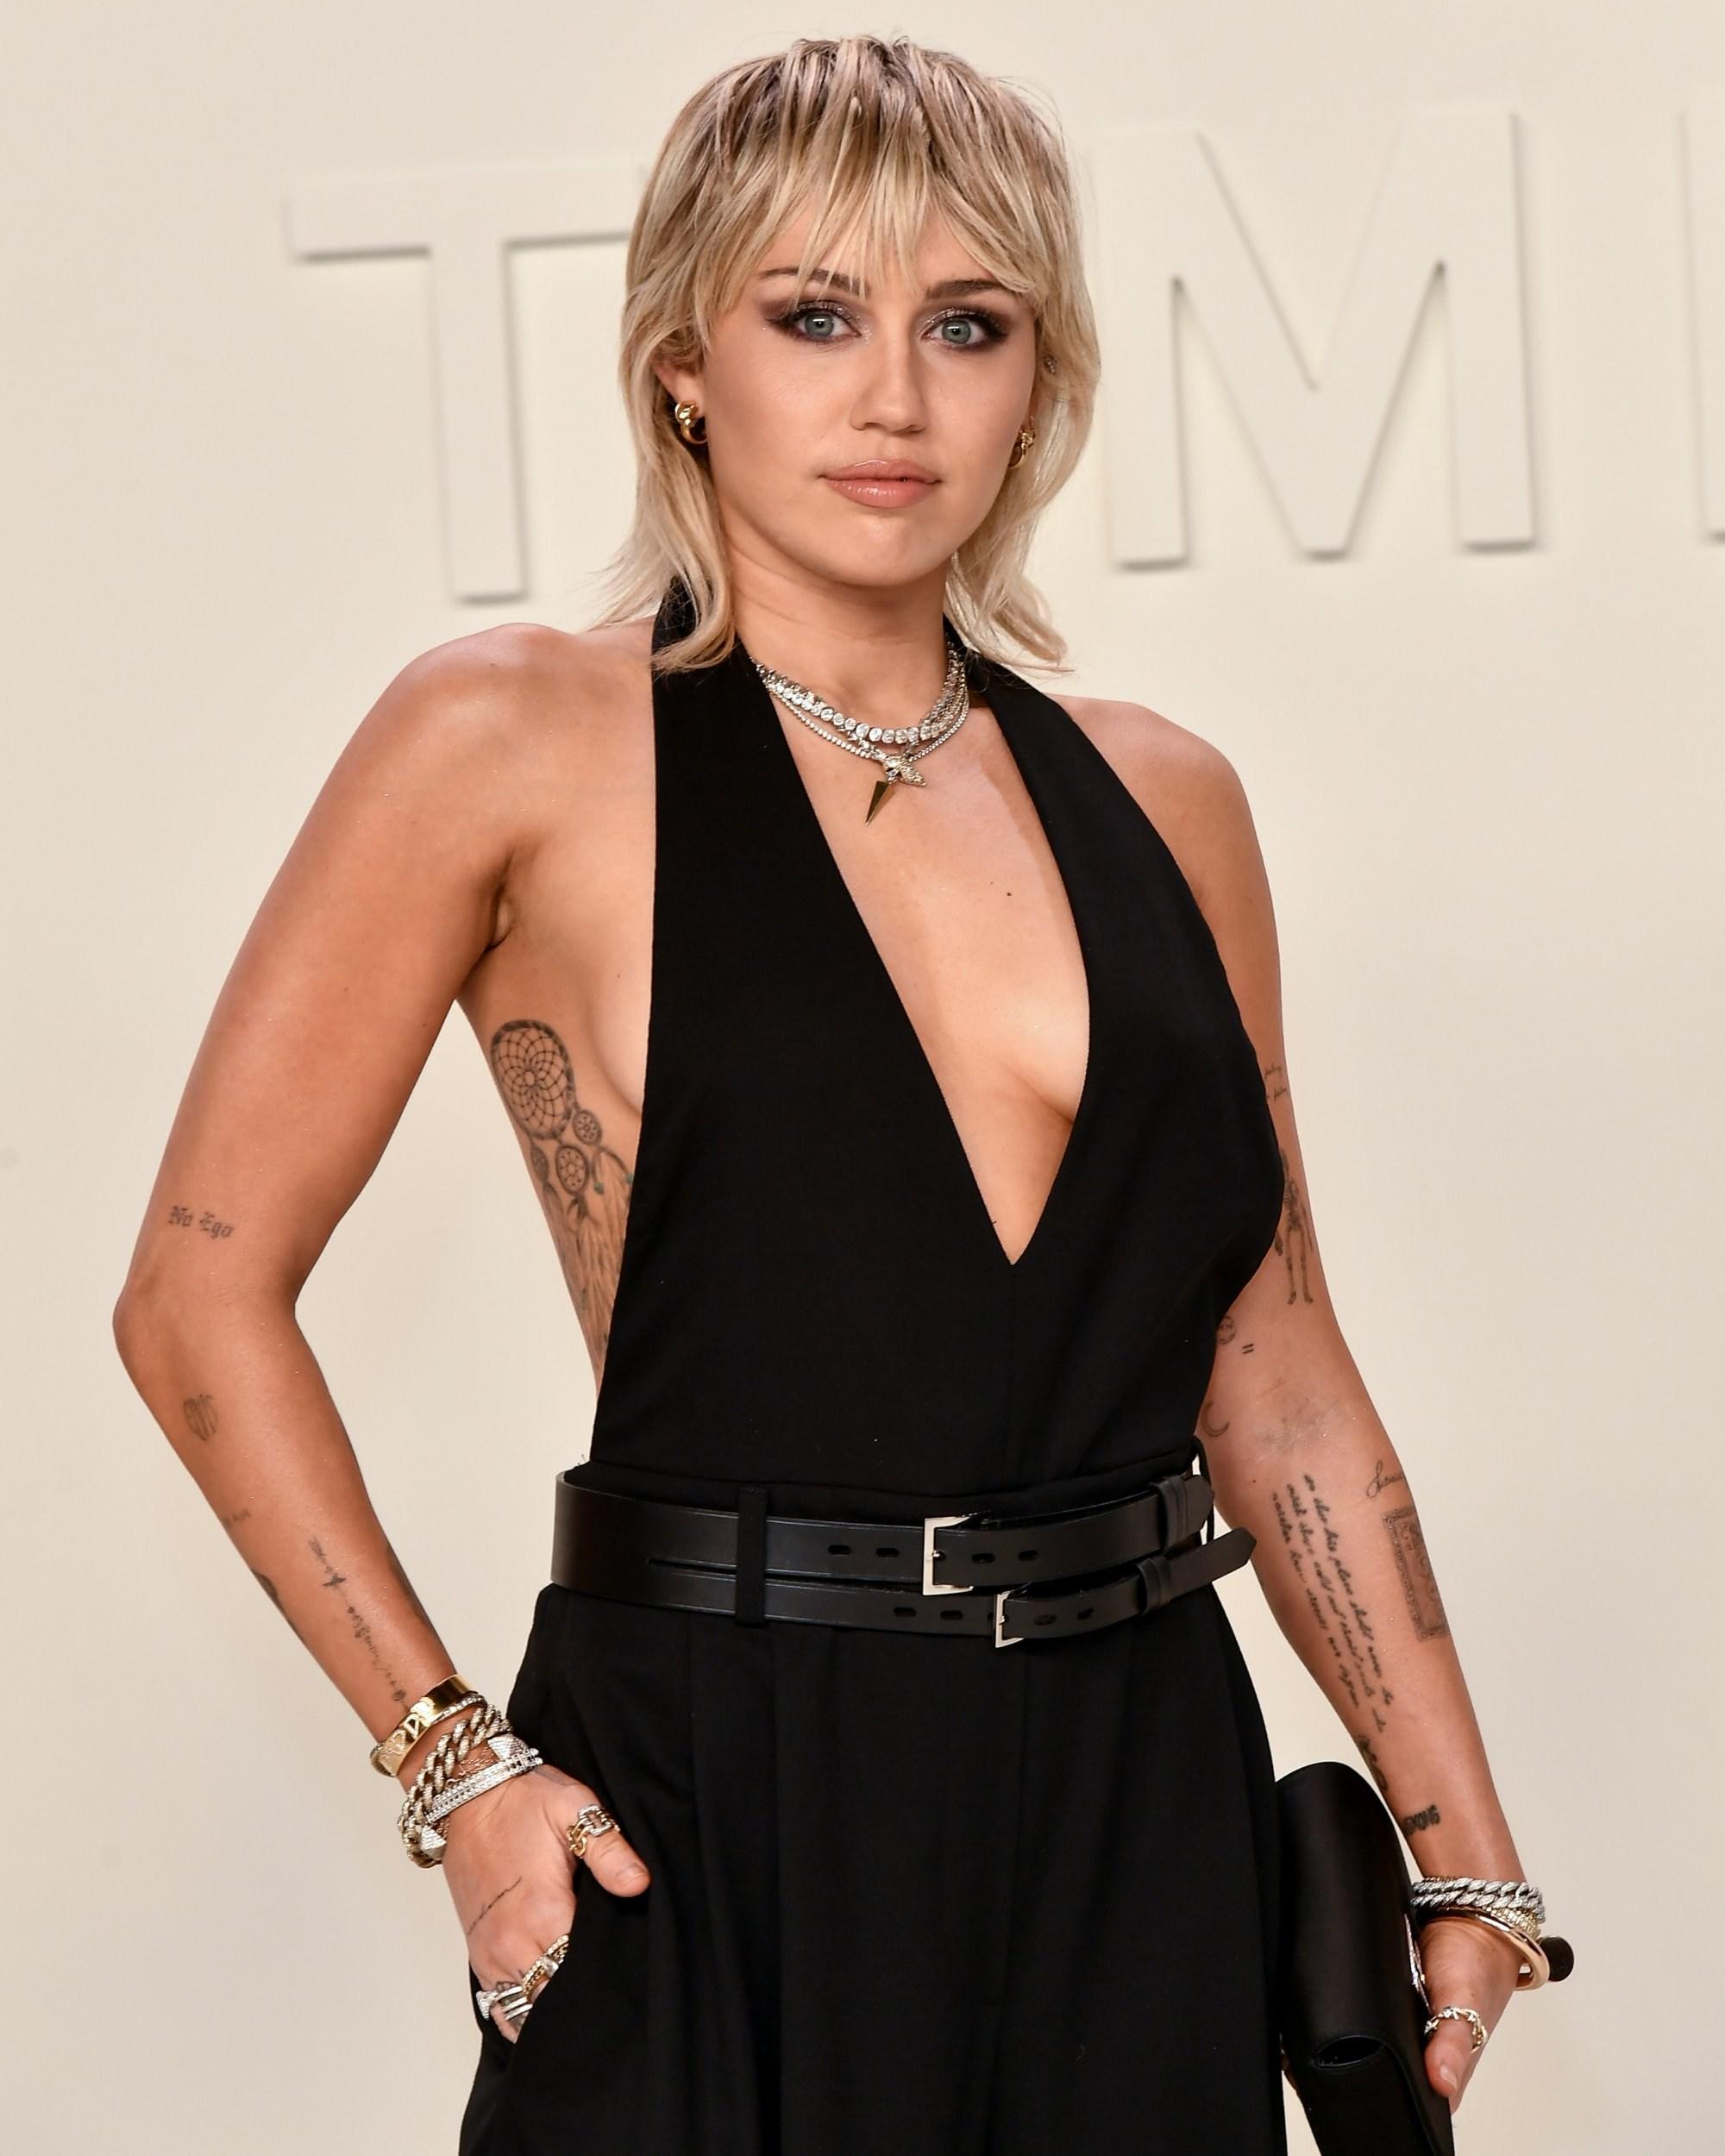 Mandatory Credit: Photo by Rob Latour/REX (10551994de) Miley Cyrus Tom Ford show, Arrivals, Fall Winter 2020, Milk Studios, Los Angeles, USA - 07 Feb 2020